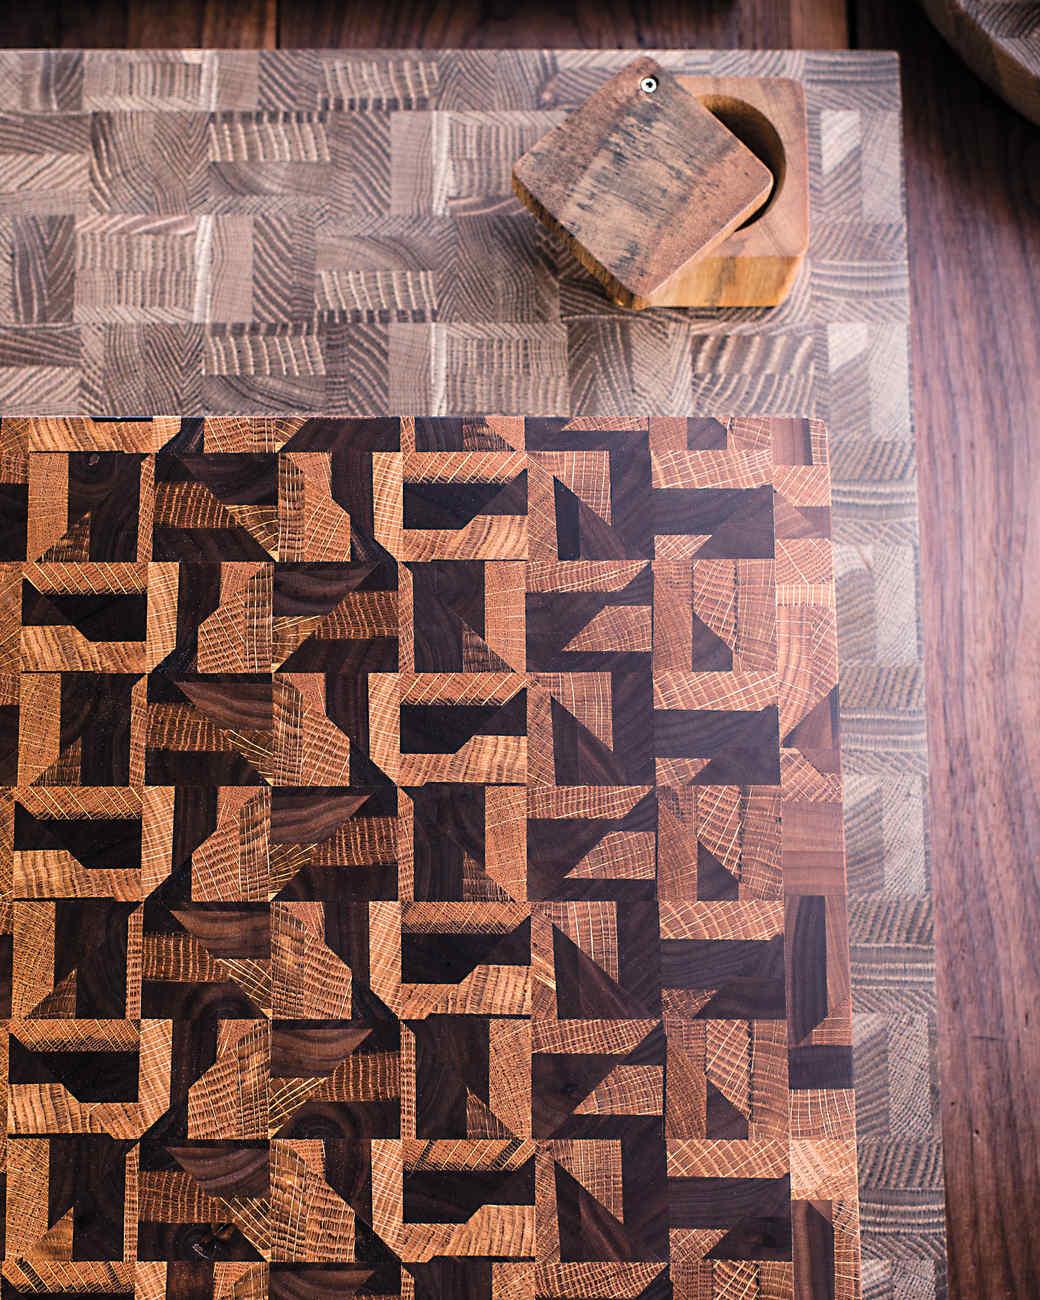 wooden-palate-522-mld110682.jpg